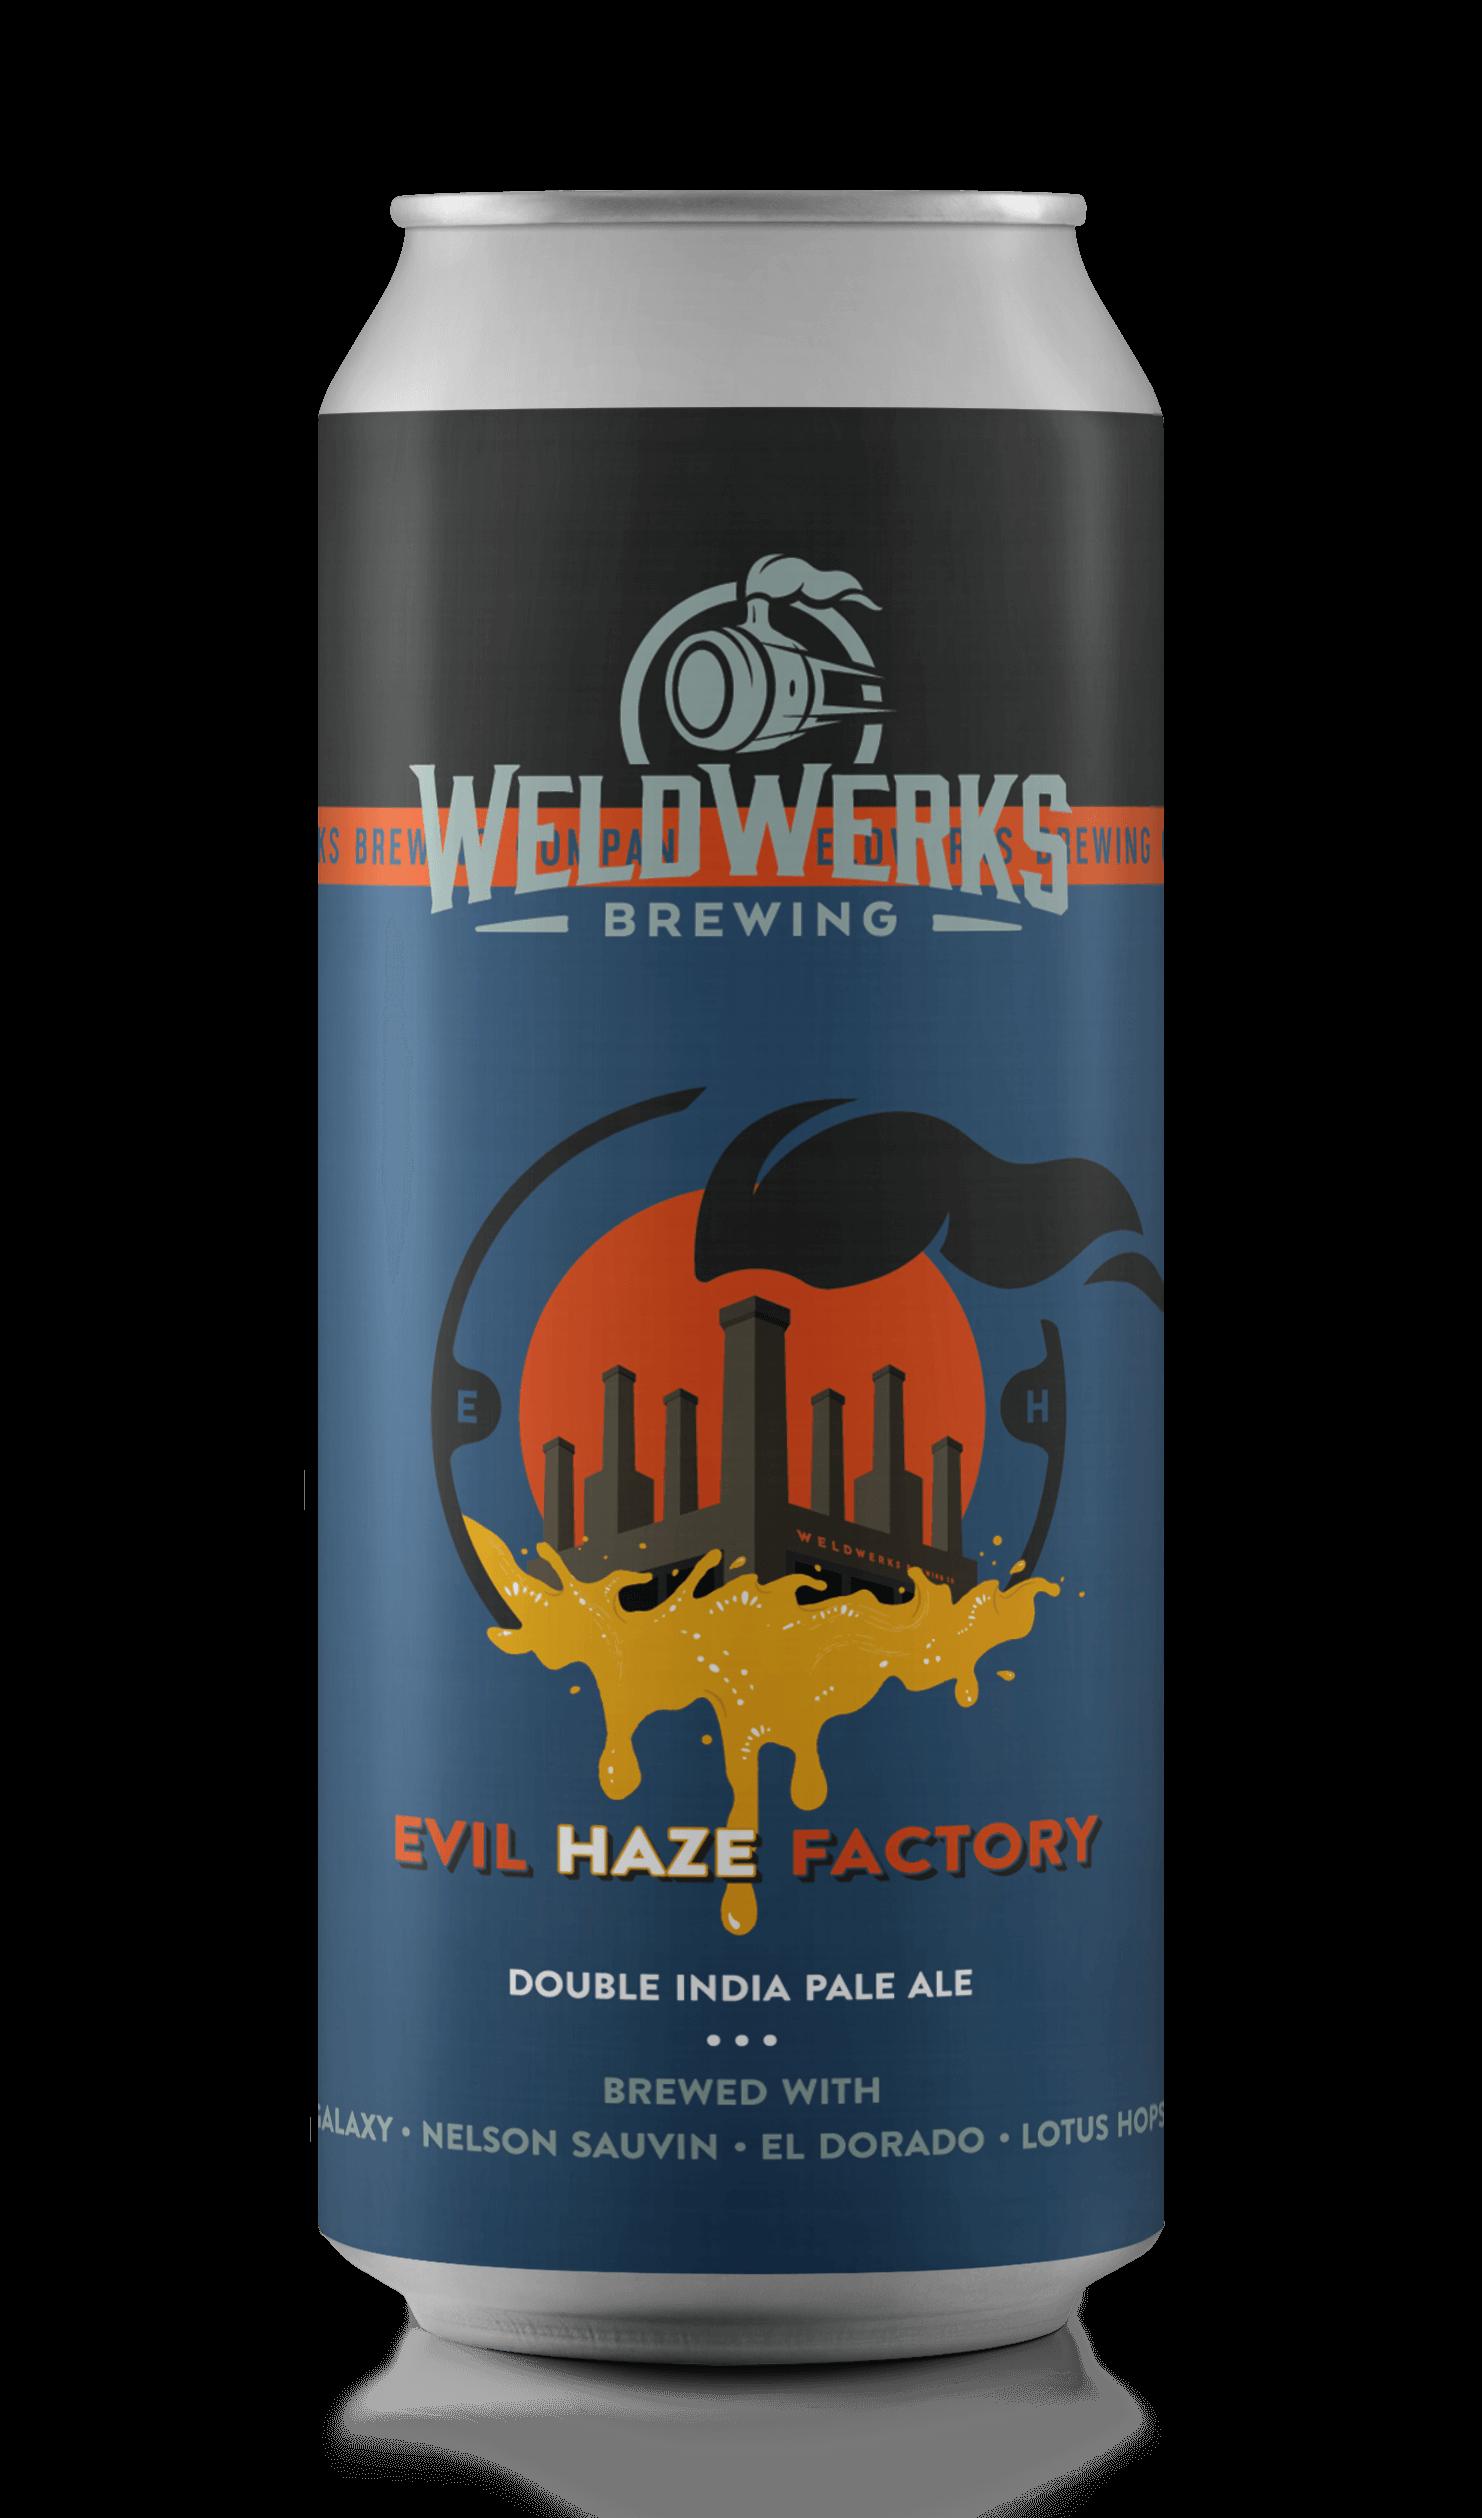 Evil Haze Factory